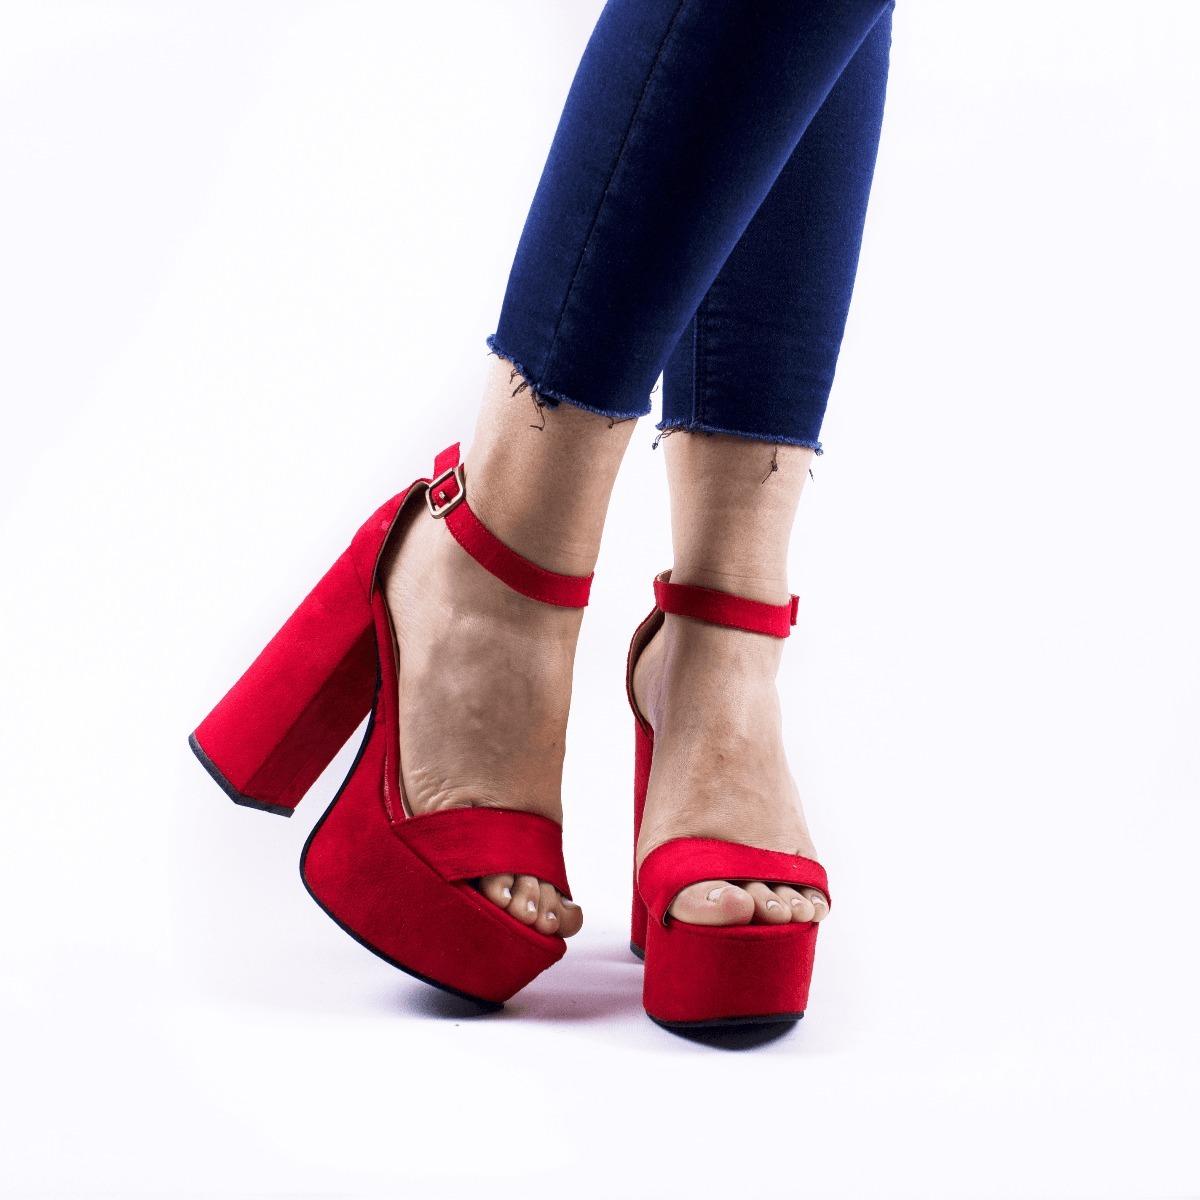 zapato mujer plataforma nuevos fiesta taco alto moda 2018. Cargando zoom. 9ed3dabf2b434